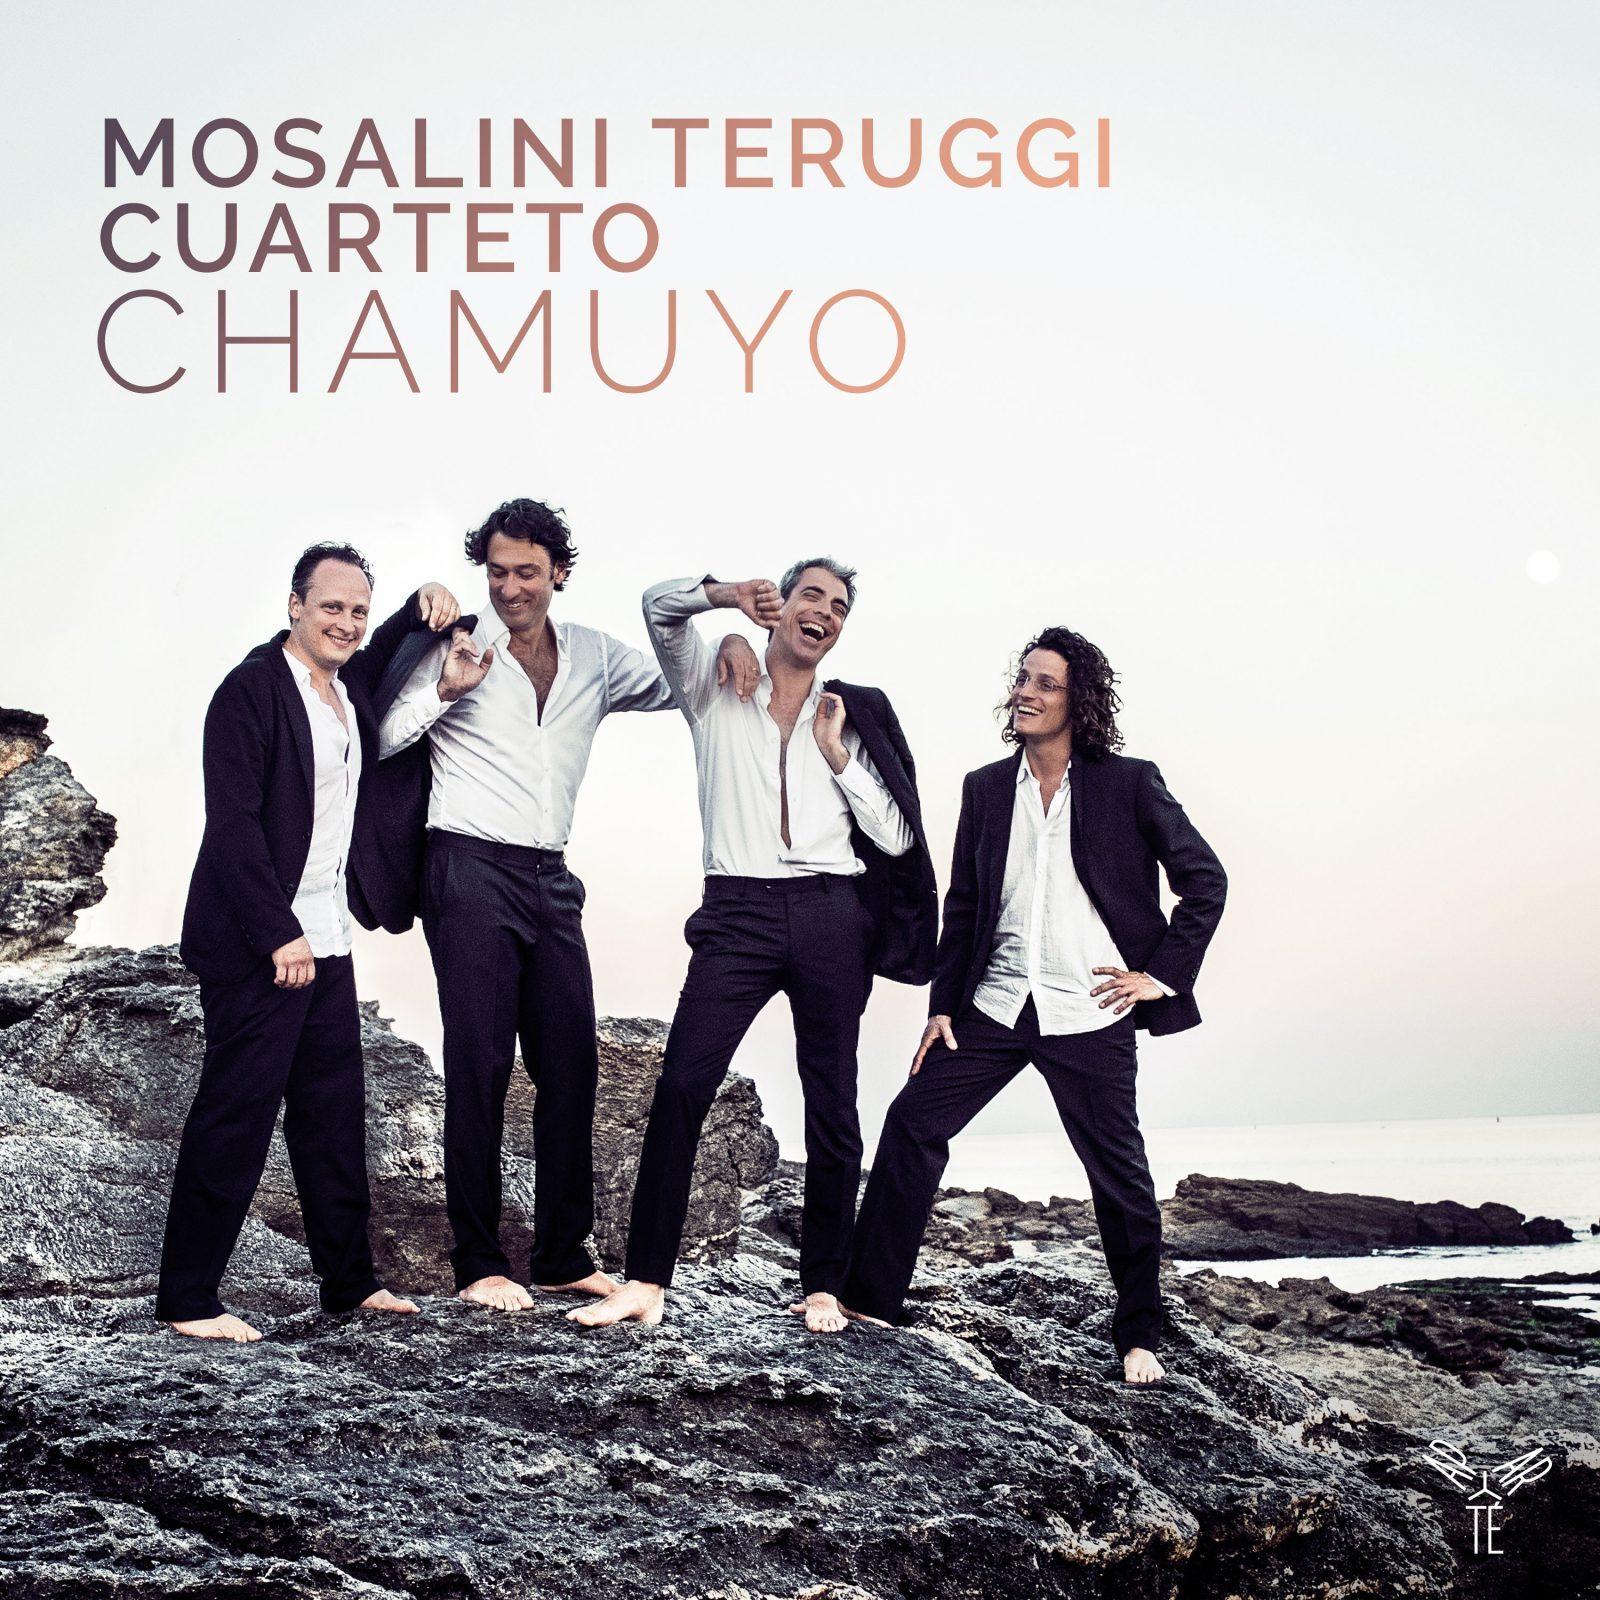 Chamuyo - Mosalini Teruggi Cuarteto